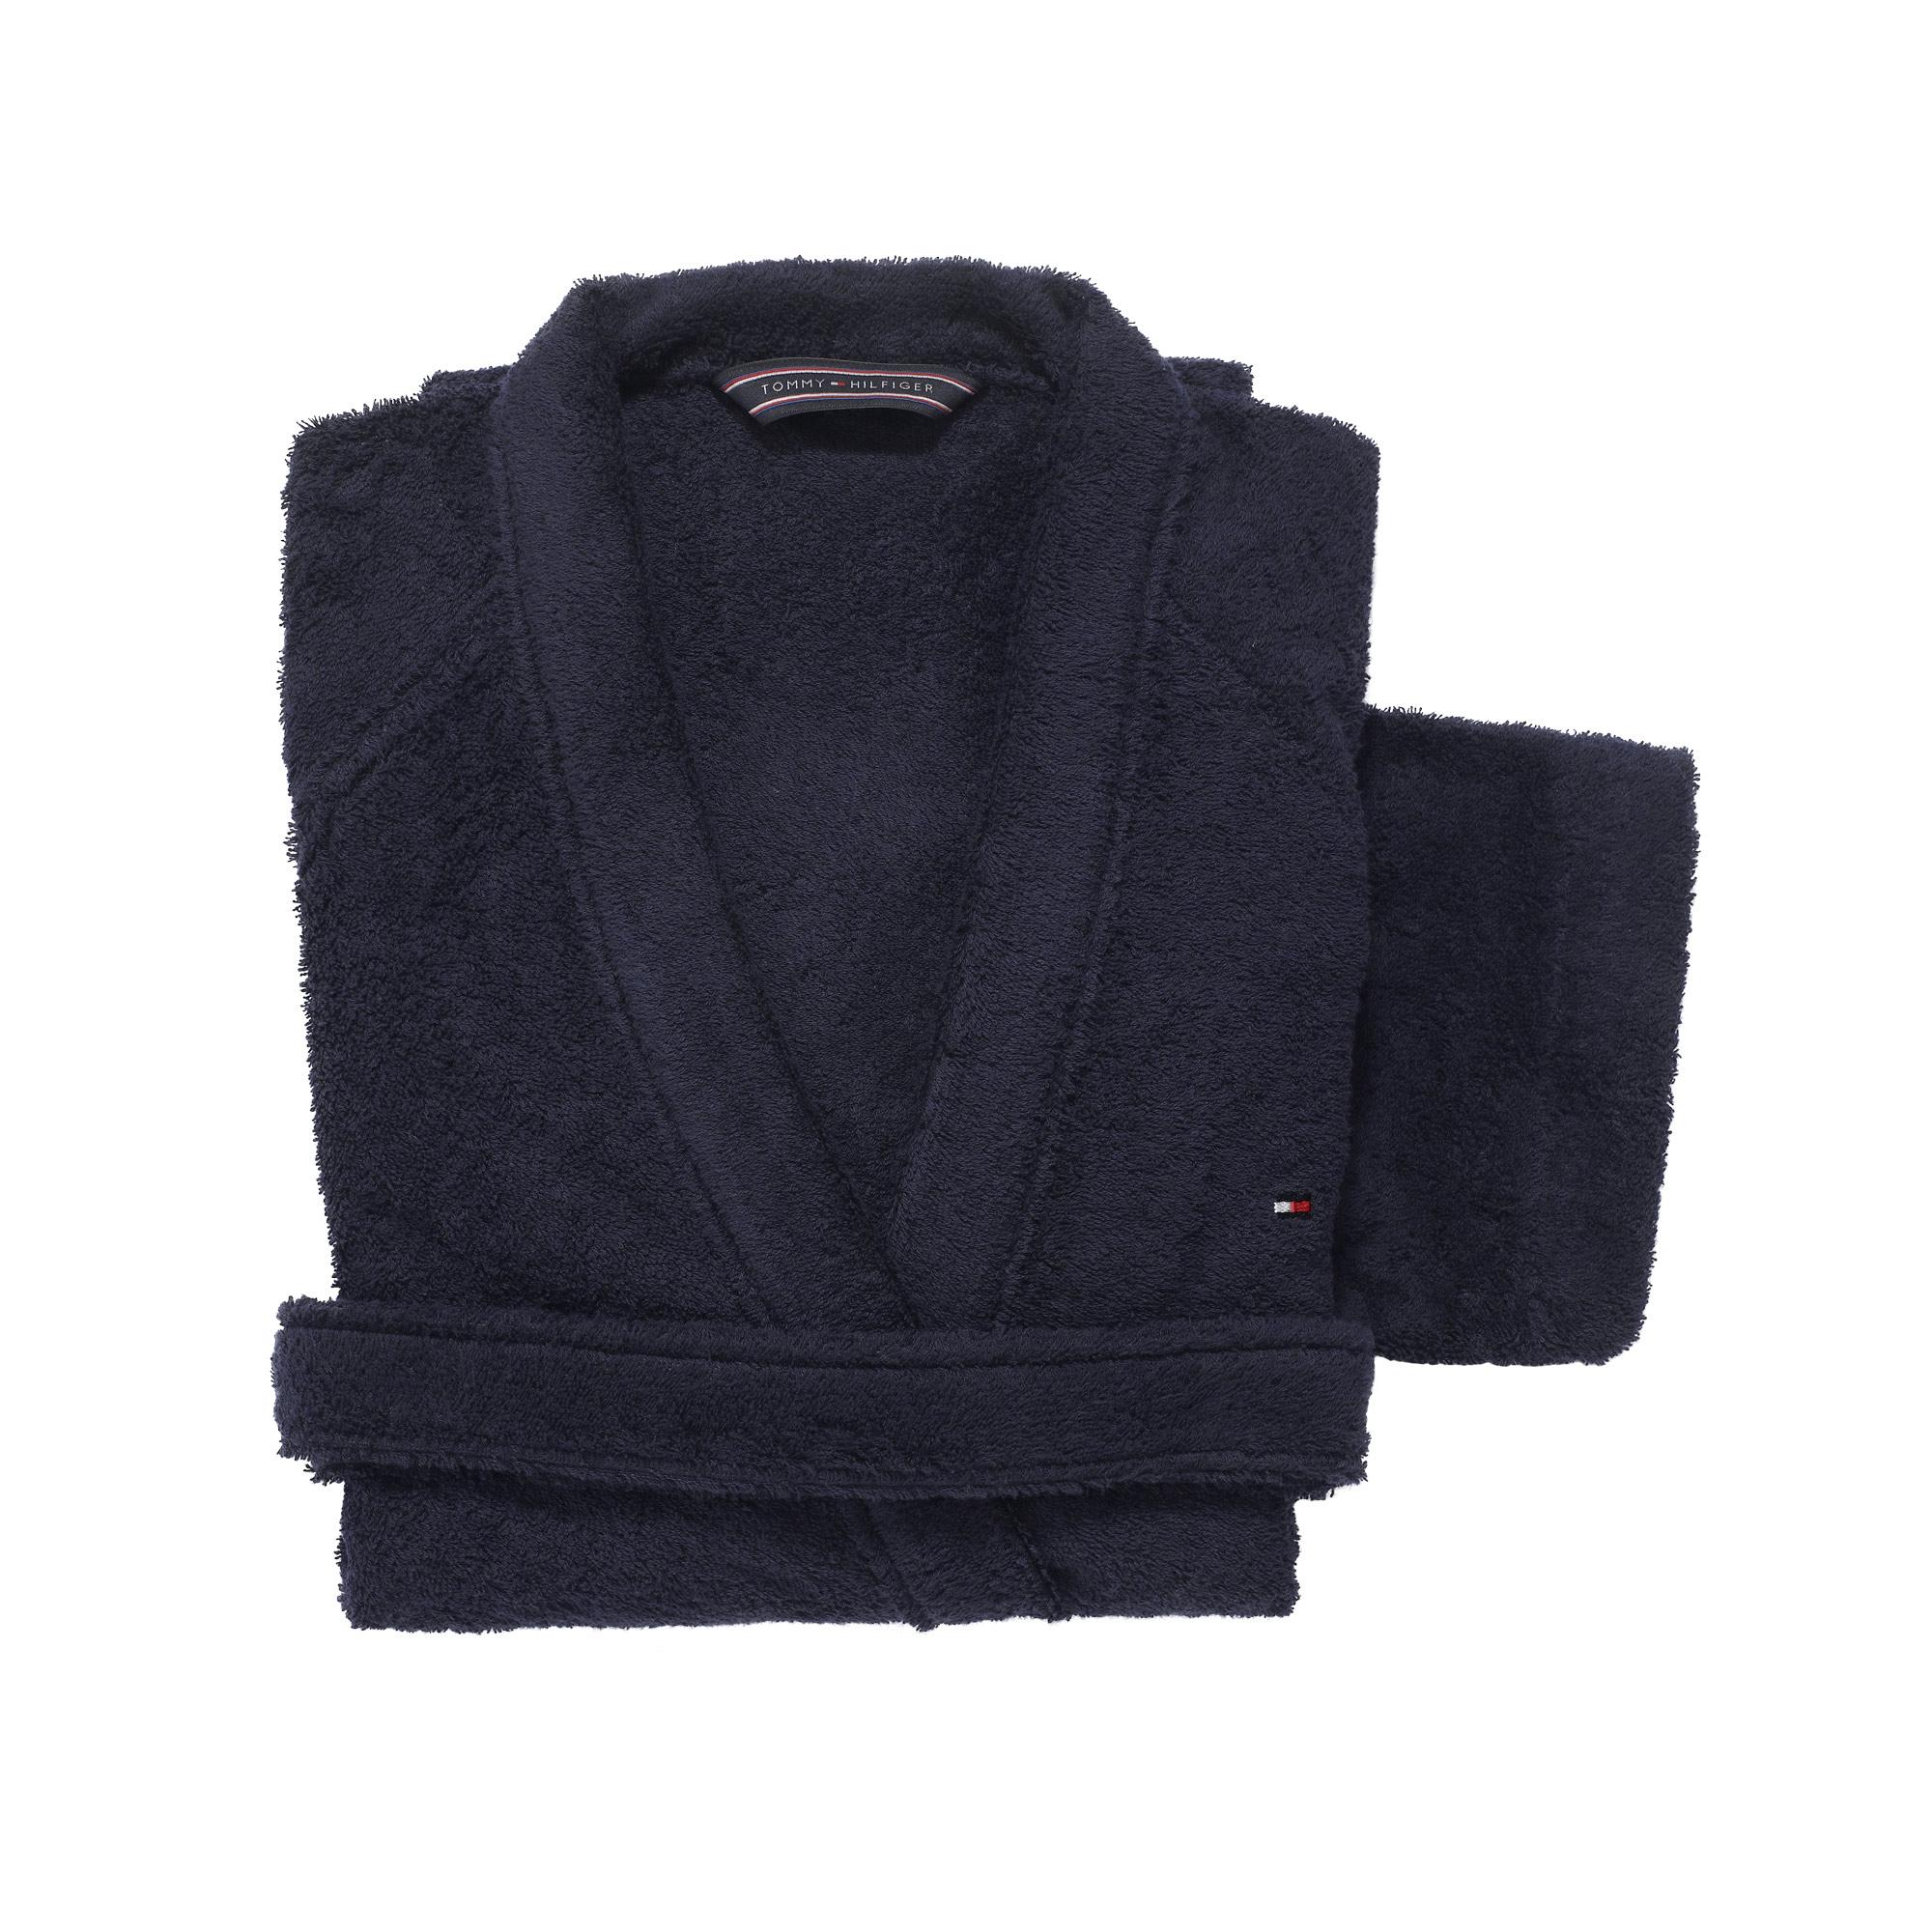 Halat de baie kimono Tommy Hilfiger Legend 2 S Albastru Navy